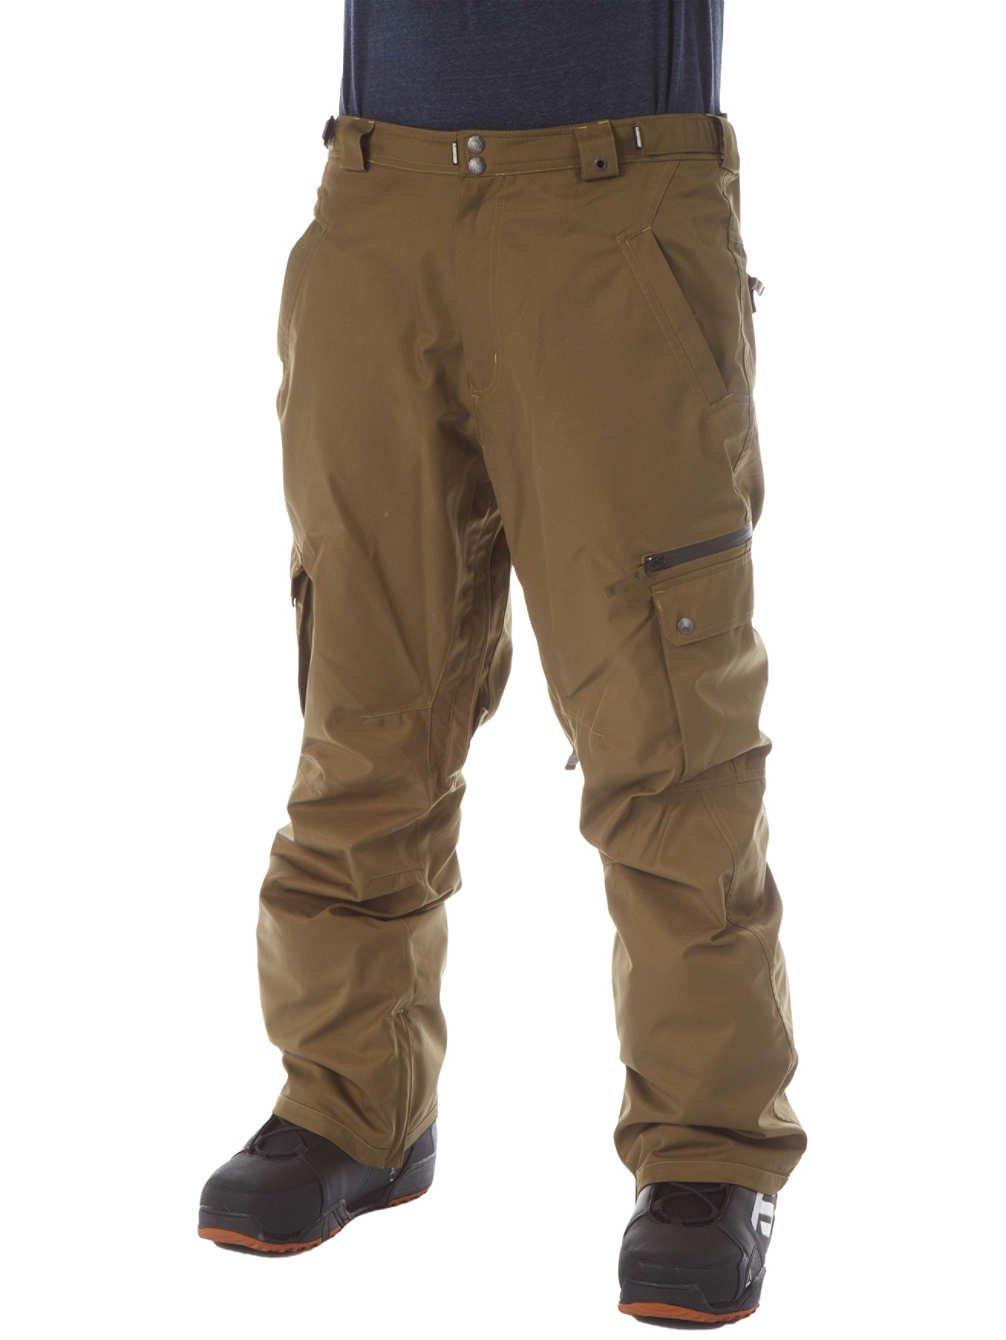 LIGHT Herren Outerwear - - Outerwear Hose Fuse 20db8c